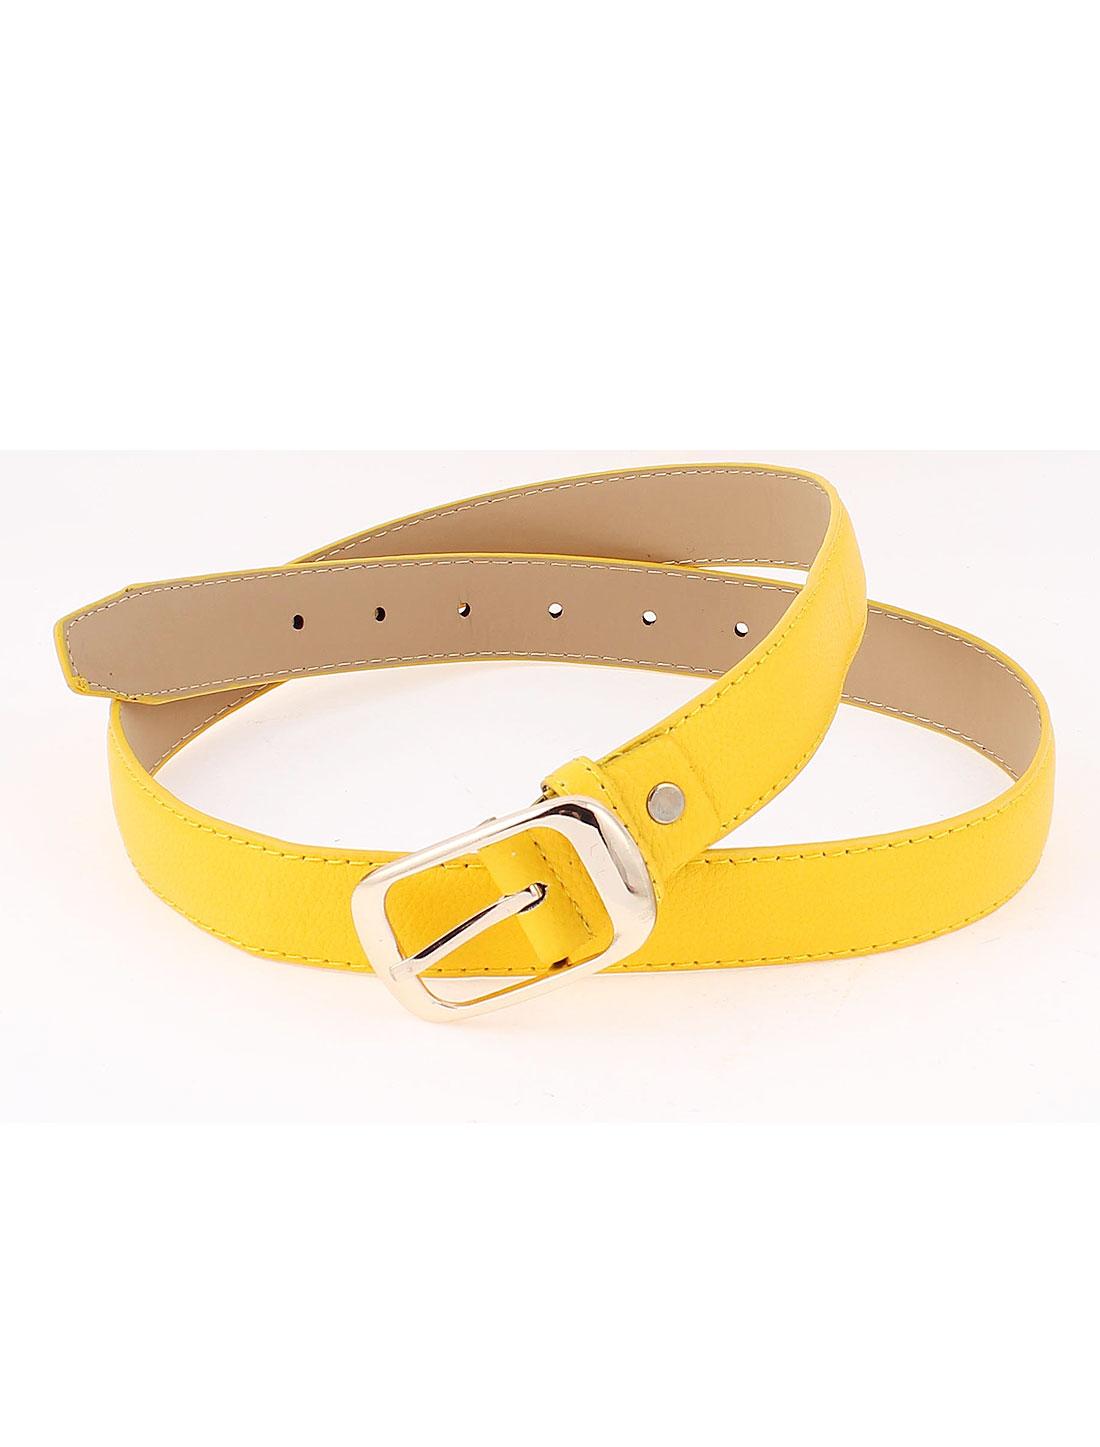 Ladies Metal Buckle Faux Leather Skinny Slim Waist Belt Band Yellow